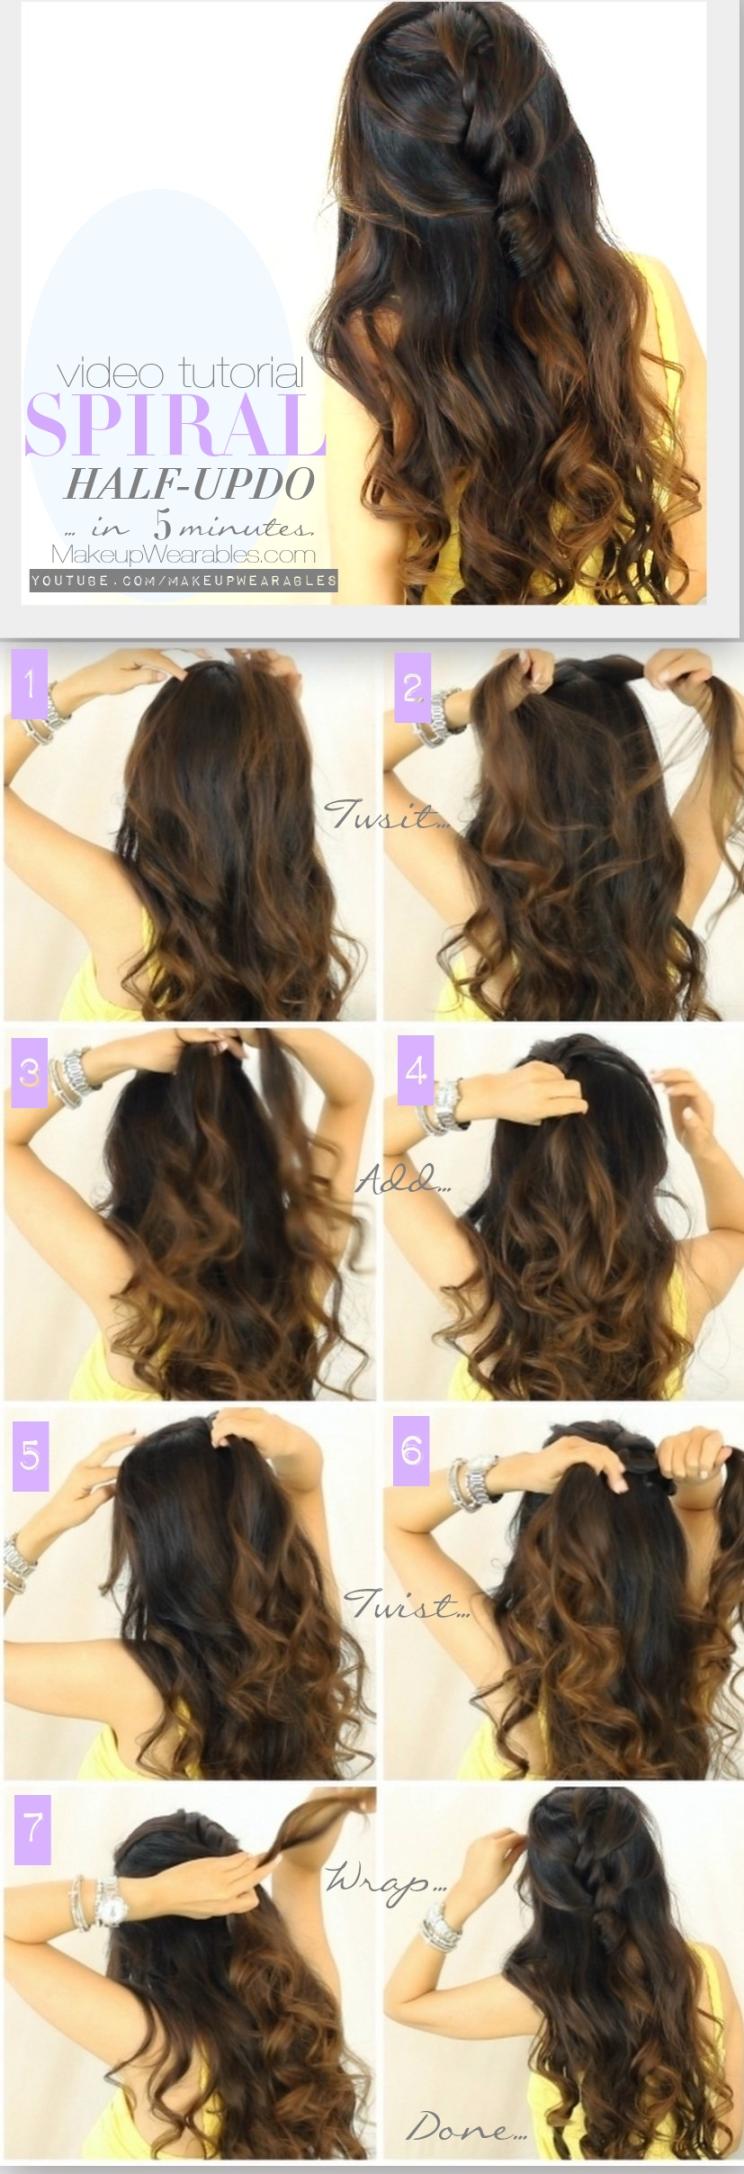 Sensational 13 Half Up Half Down Hair Tutorials Short Hairstyles For Black Women Fulllsitofus